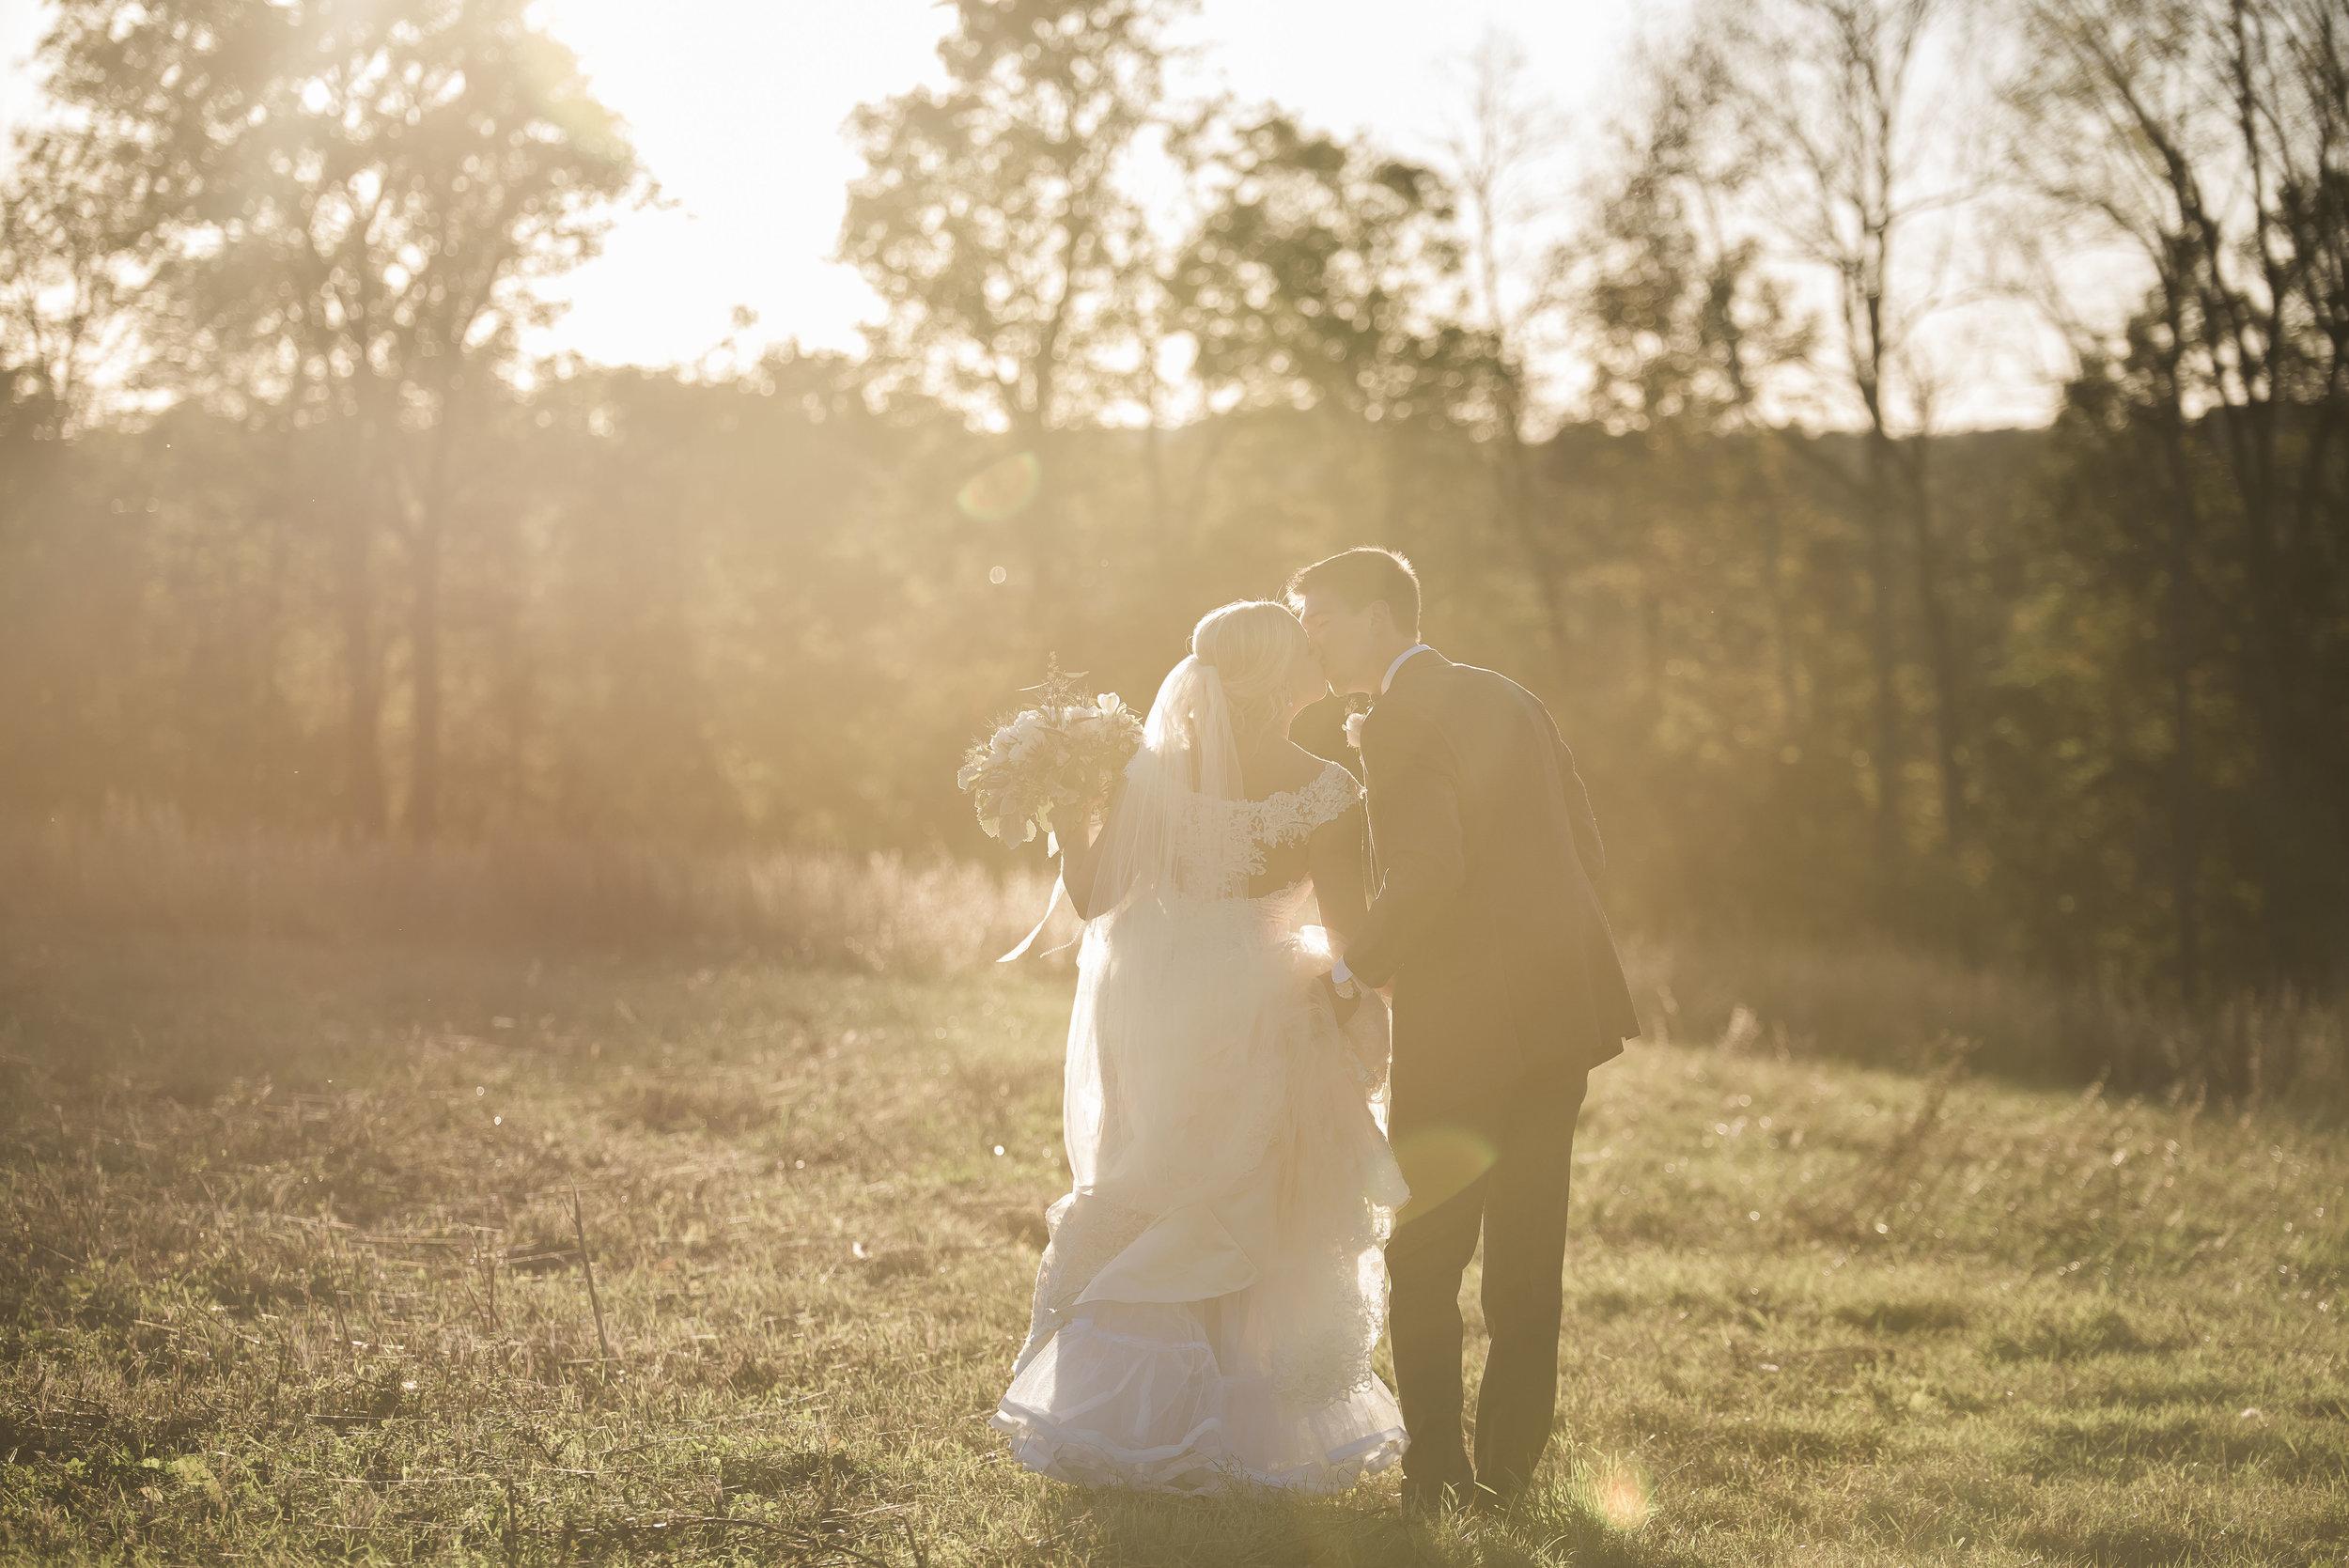 weddingbowlinggreenphotographercassieadkins_607.JPG